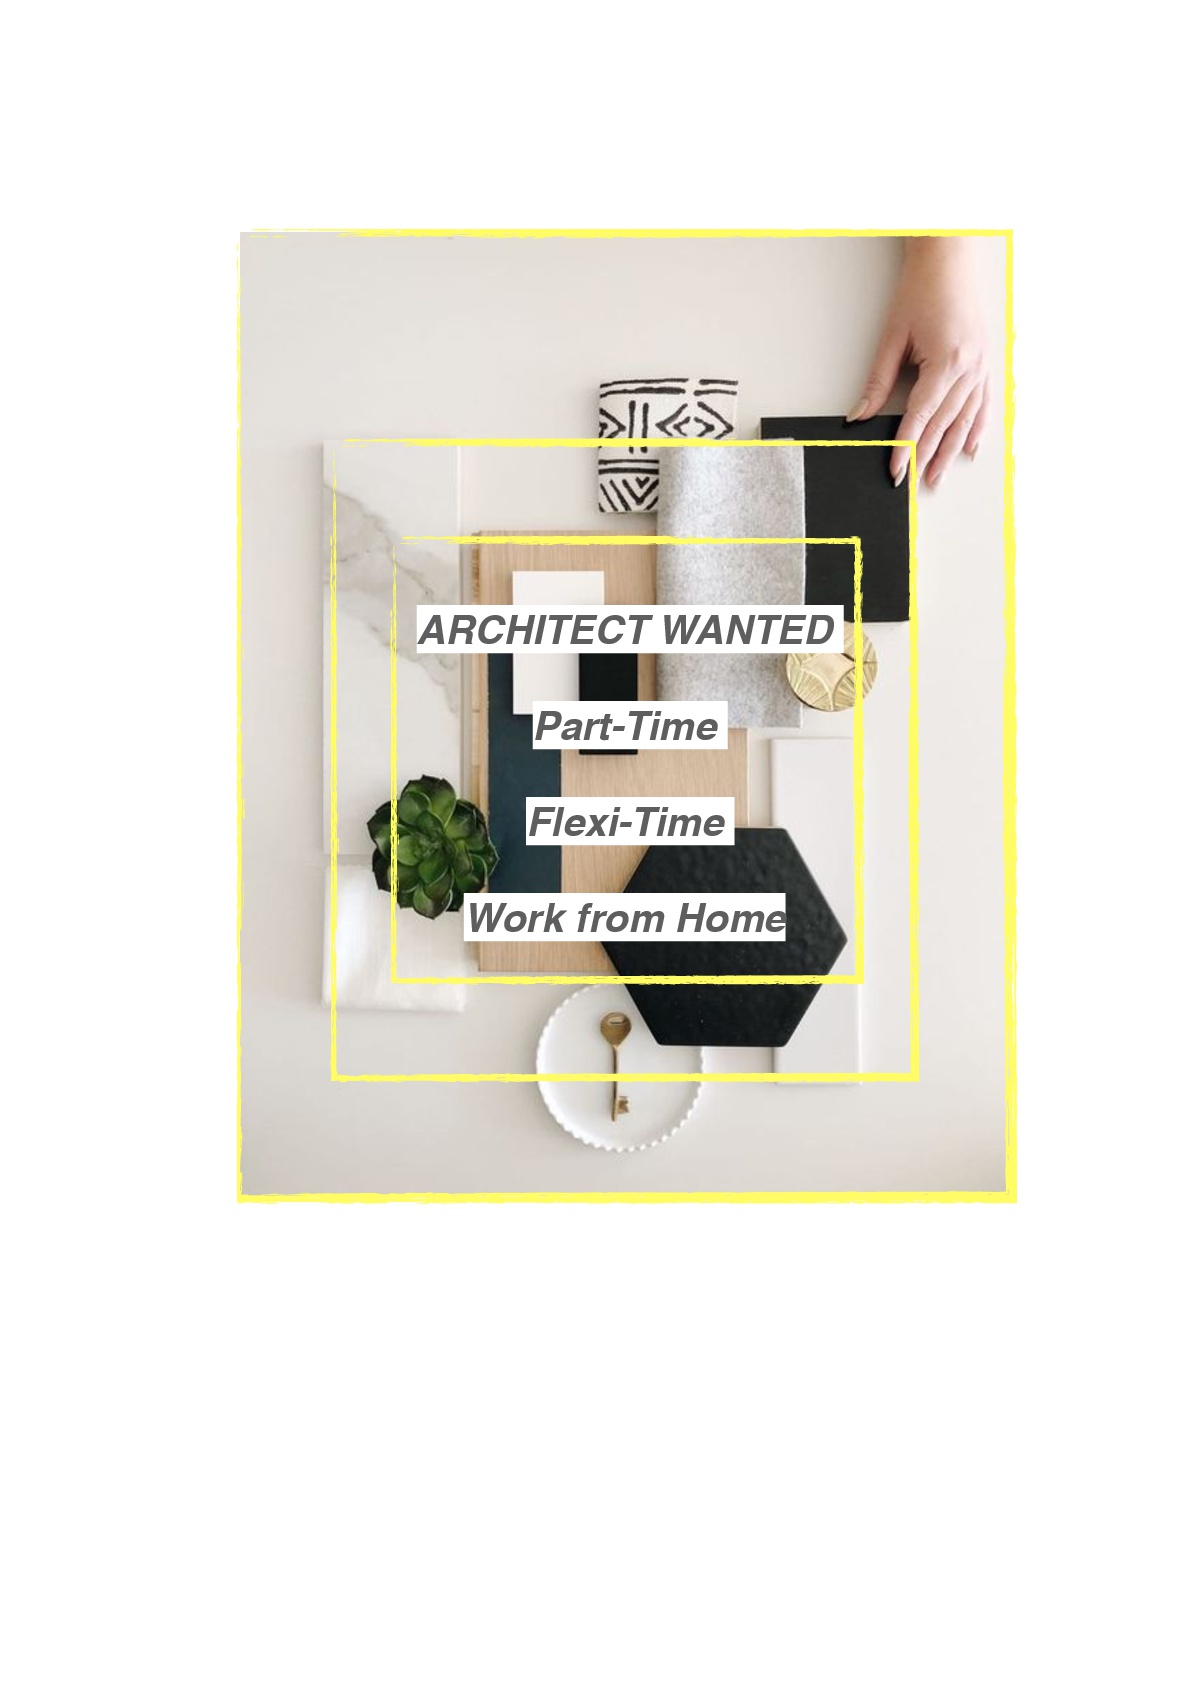 StauntonHenderson Architect ireland job-001 Portrait .jpg